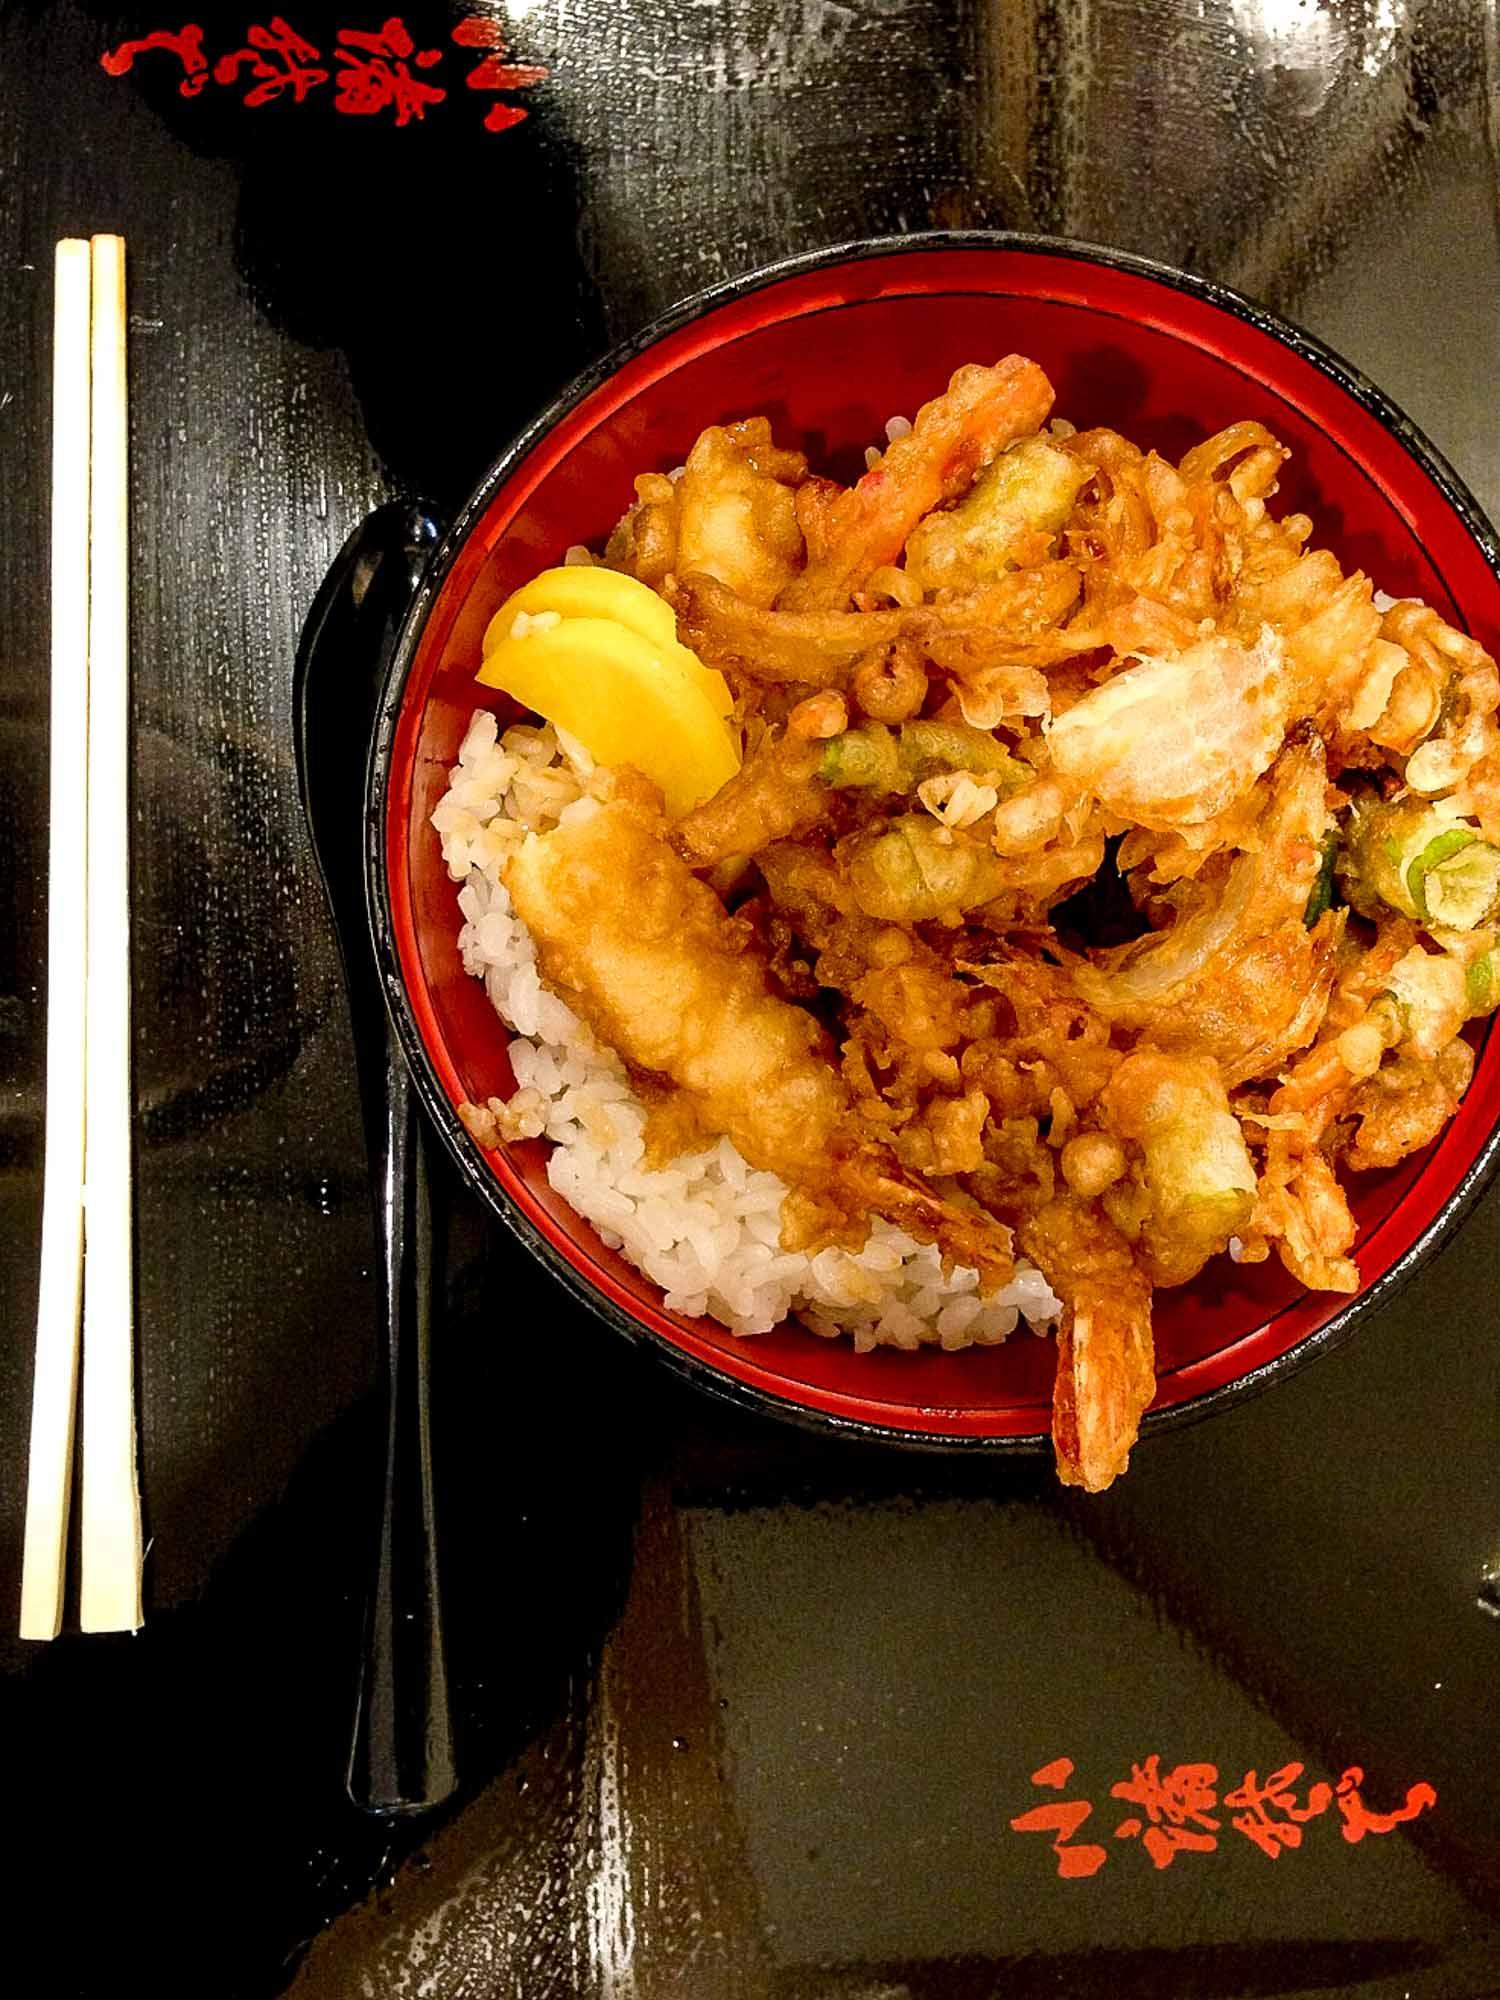 Shrimp tempura in a bowl, common in Japanese cuisine